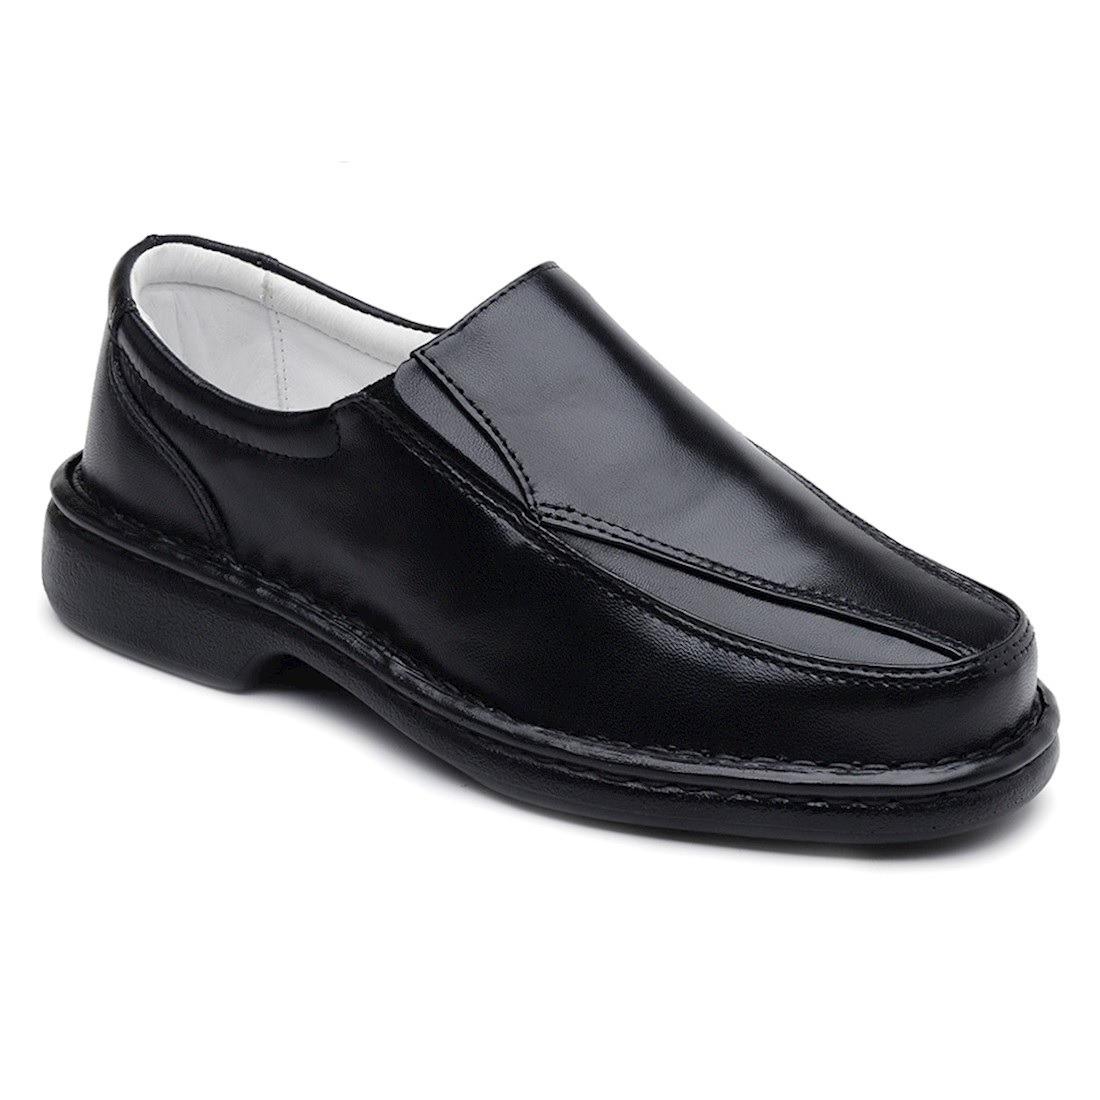 deeb5ccbe4 sapato anti stress couro carneiro legítimo ranster. Carregando zoom.